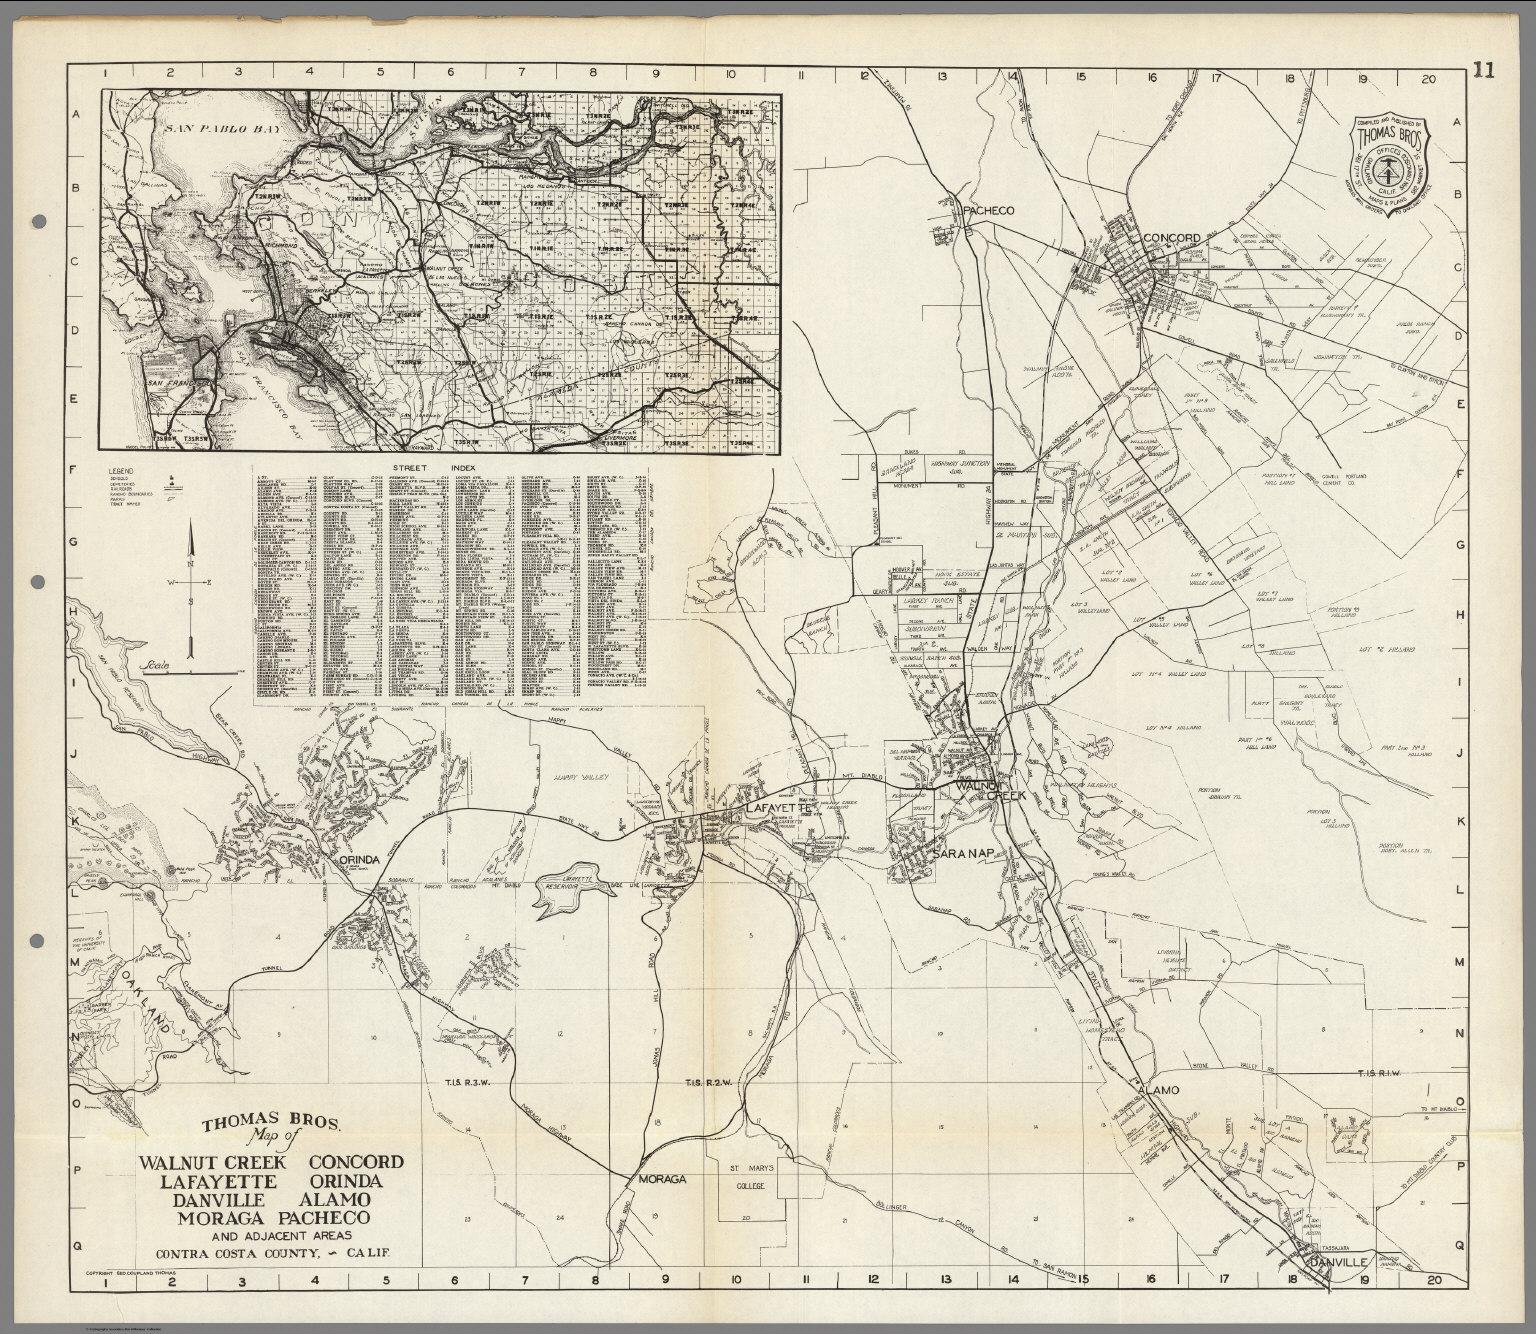 Pacheco California Map.Thomas Bros Walnut Creek Concord Lafayette Orinda Danville